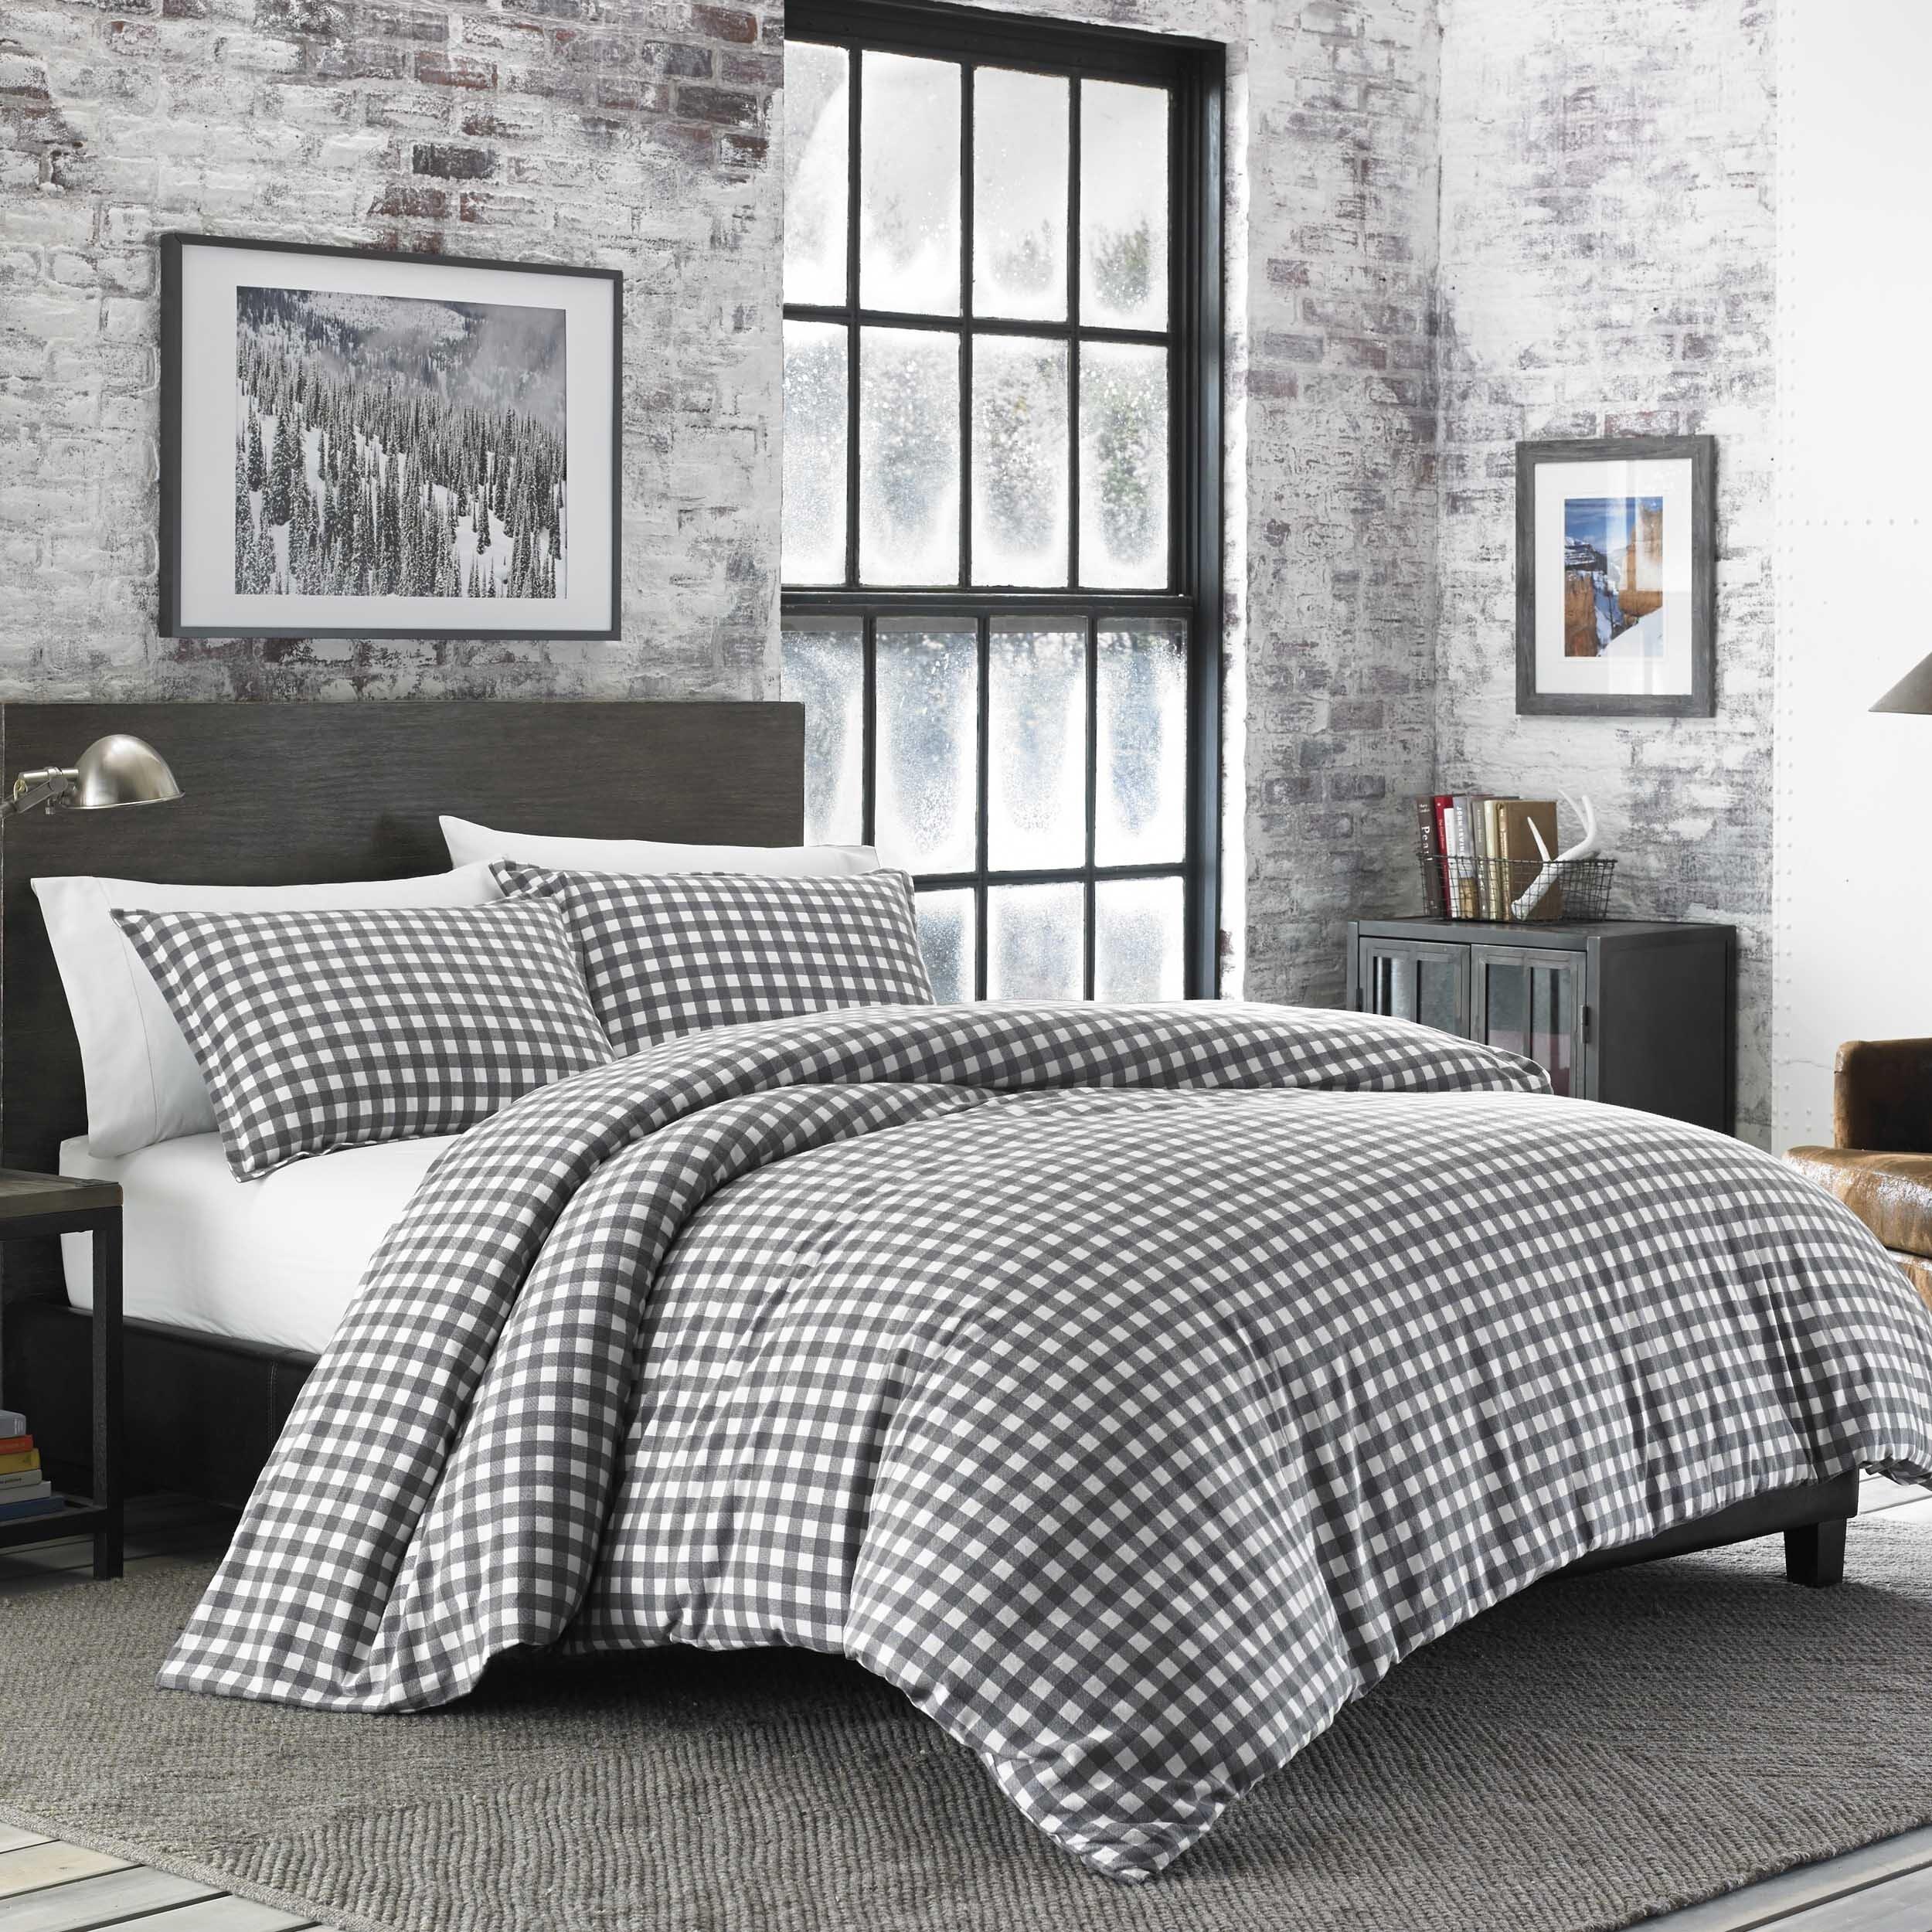 Ultra Soft Plush Cozy Reversible White Grey Flannel Comforter Set New Home Garden Bedding